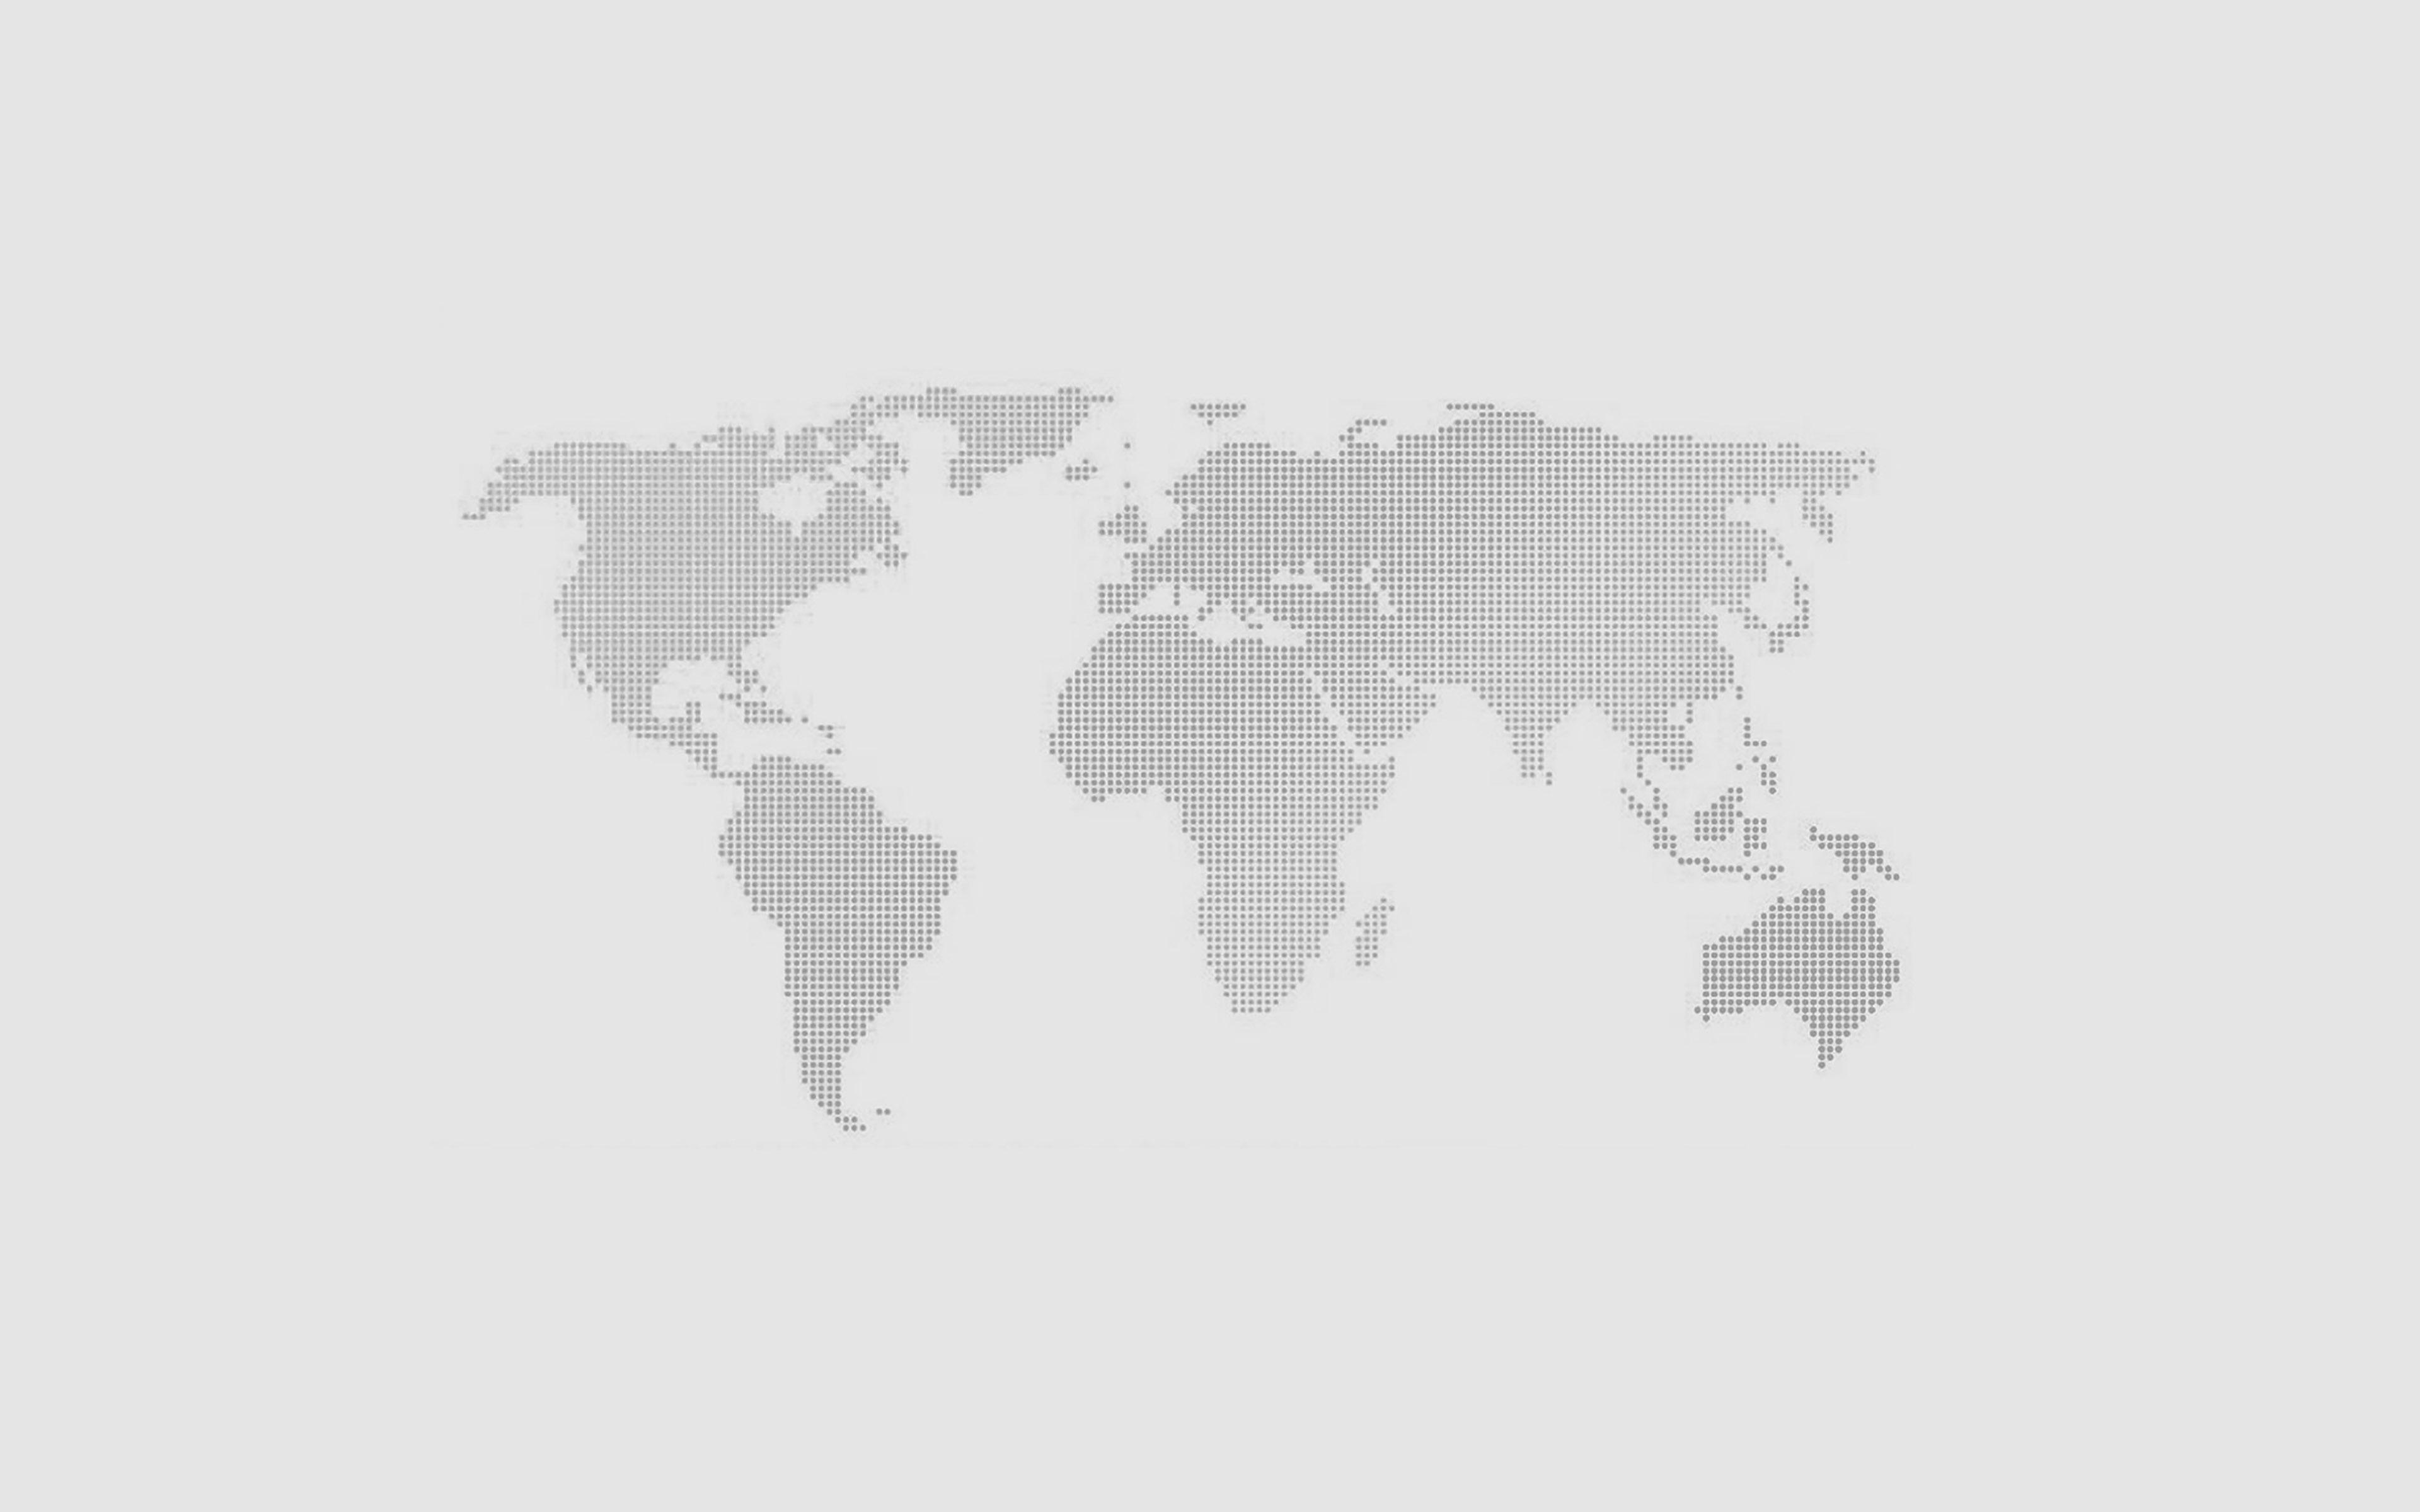 Google Images Fall Wallpaper Aa40 Worldmap Dark Gray Art Papers Co